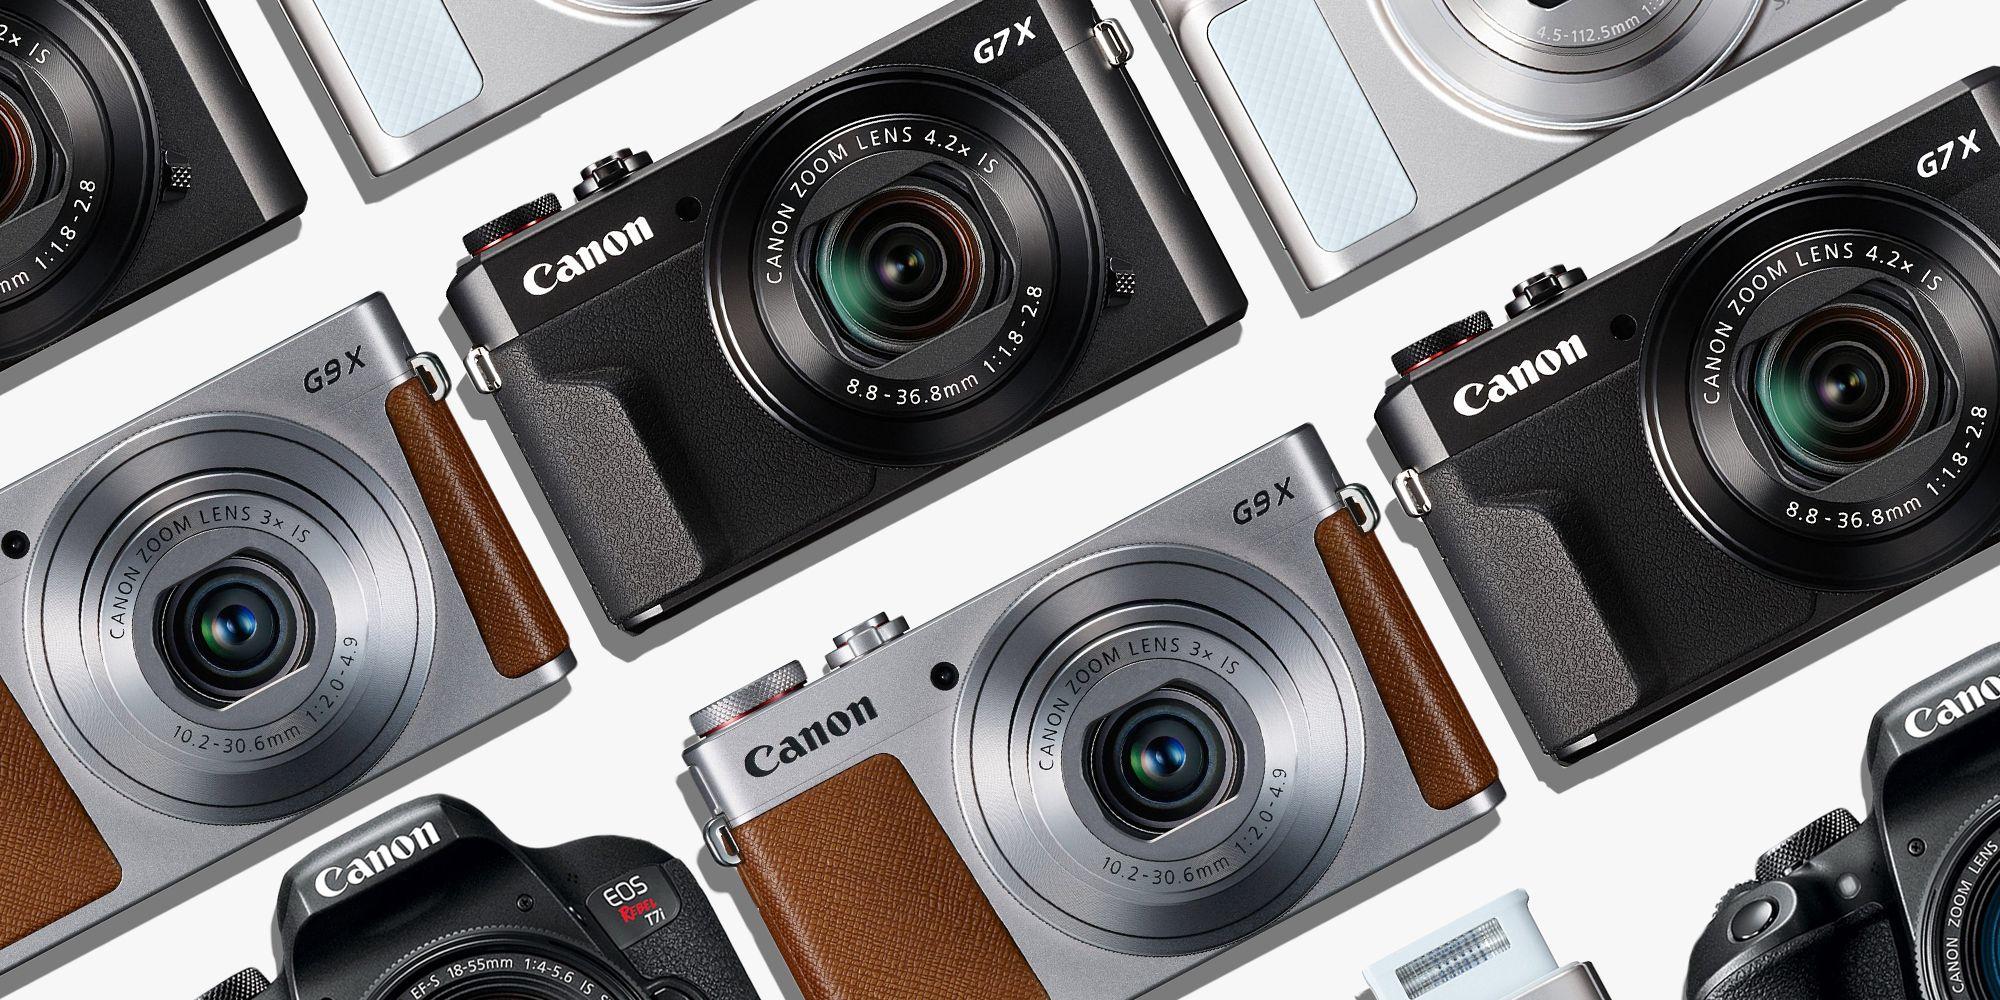 10 Best Canon Cameras To Buy In 2018 Dslr Camera Reviews Lens Parts Diagram Nikon Related Keywords